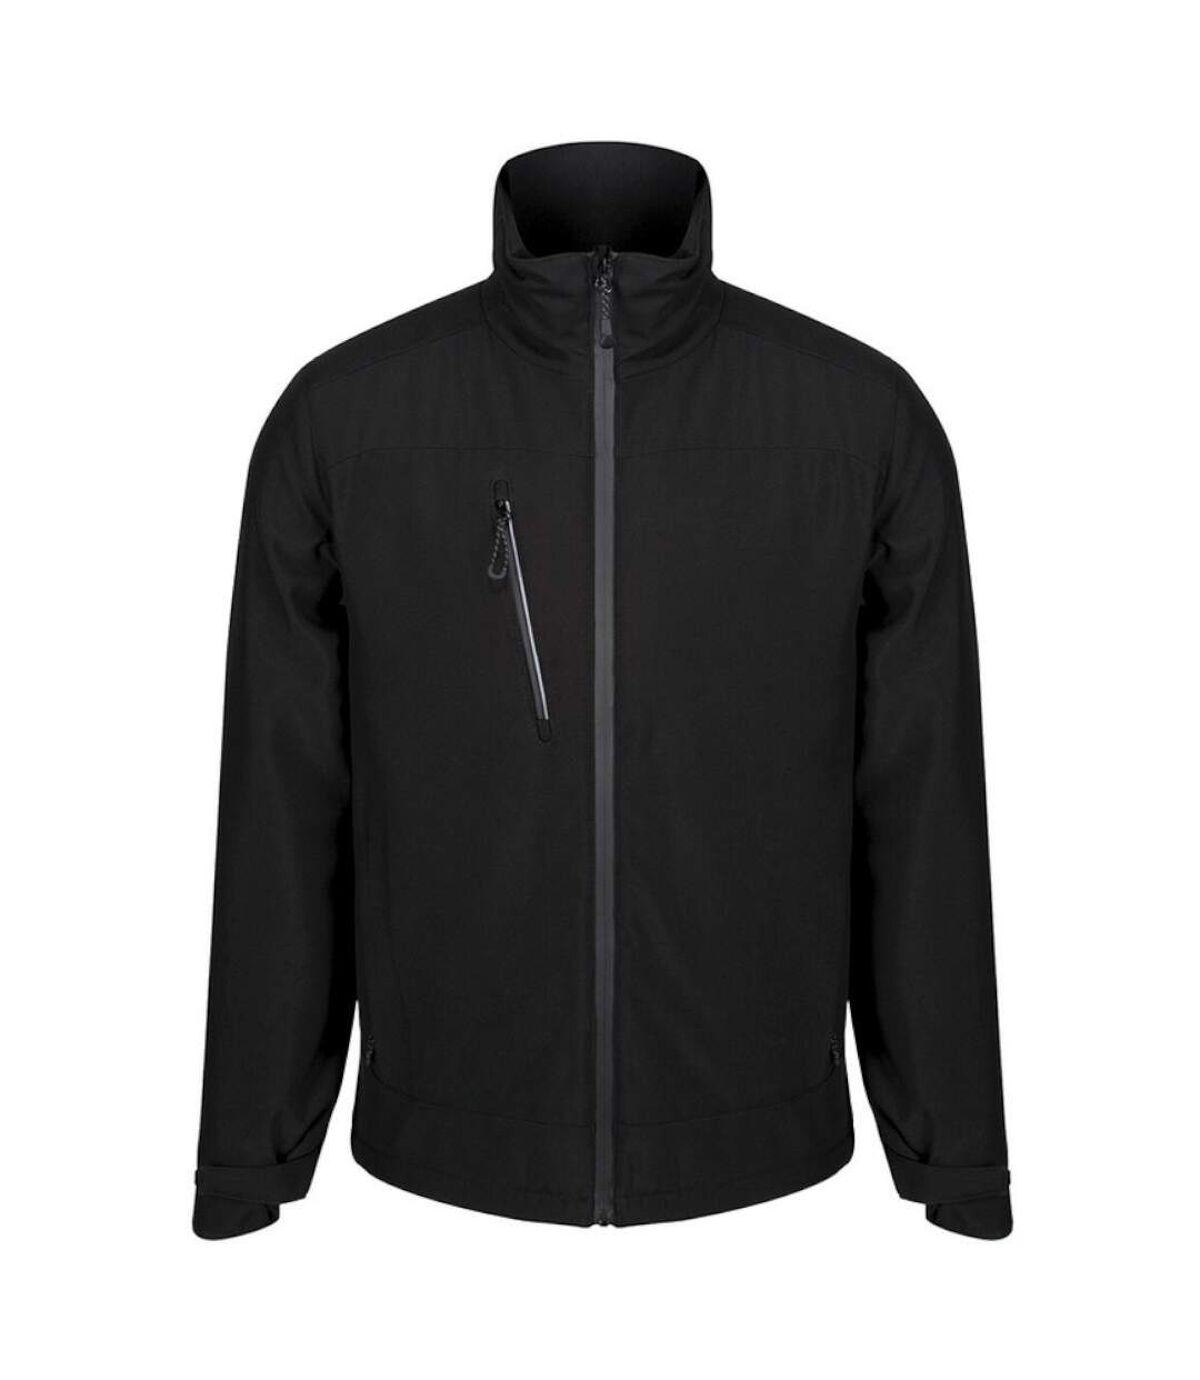 Regatta Professional Mens Bifrost Insulated Soft Shell Jacket (Black) - UTPC4065